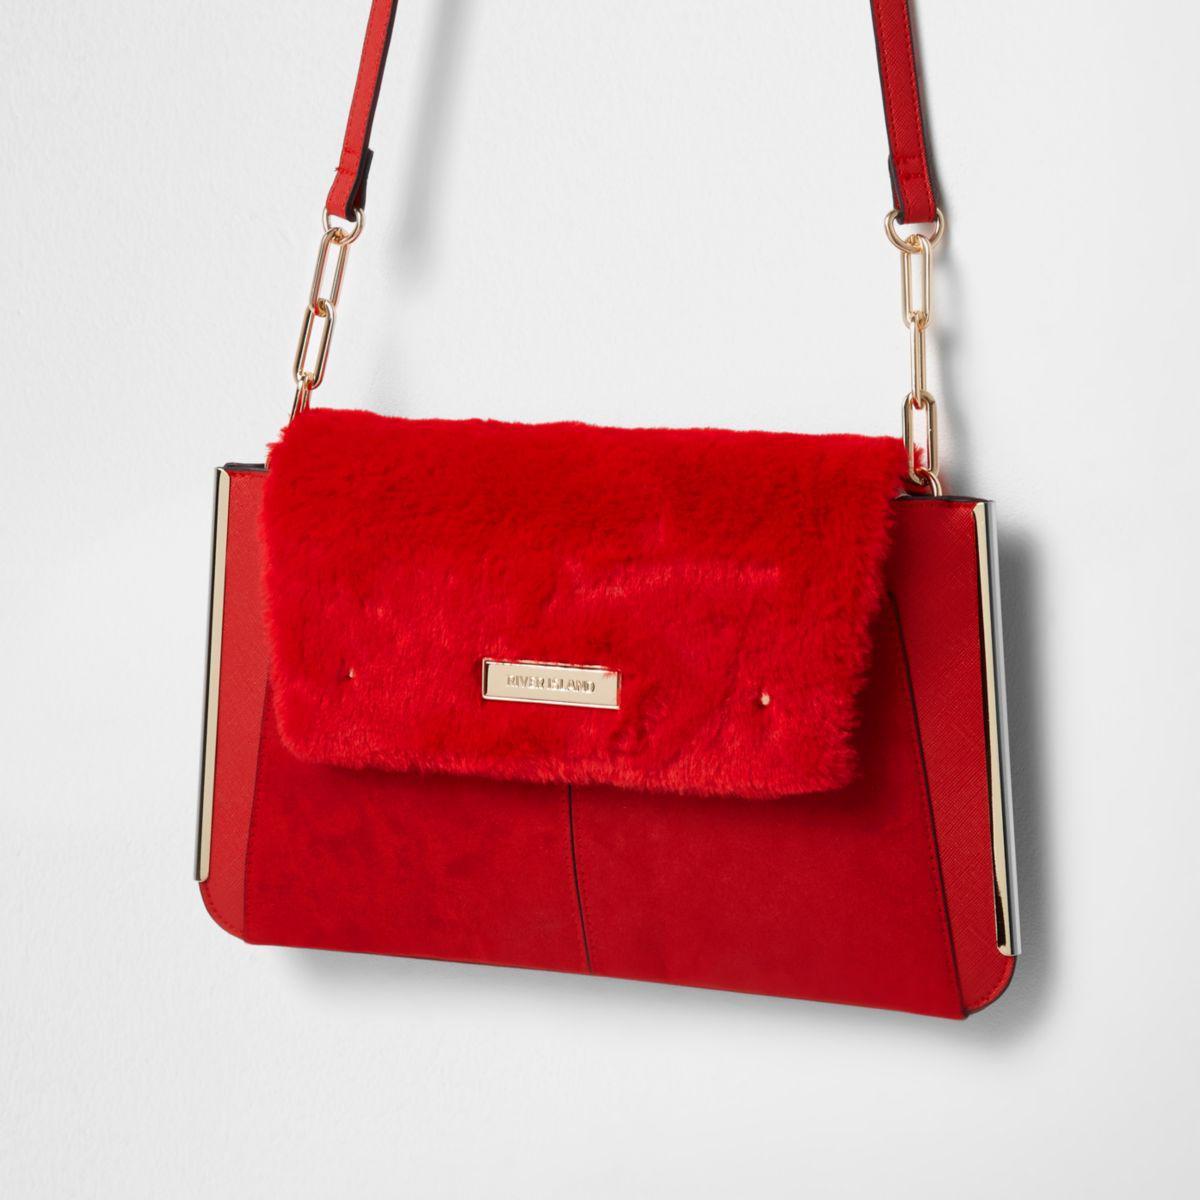 River Island. Women s Red Faux Fur Flap Envelope Clutch Bag Red Faux Fur  Flap Envelope Clutch Bag e5222aff33450